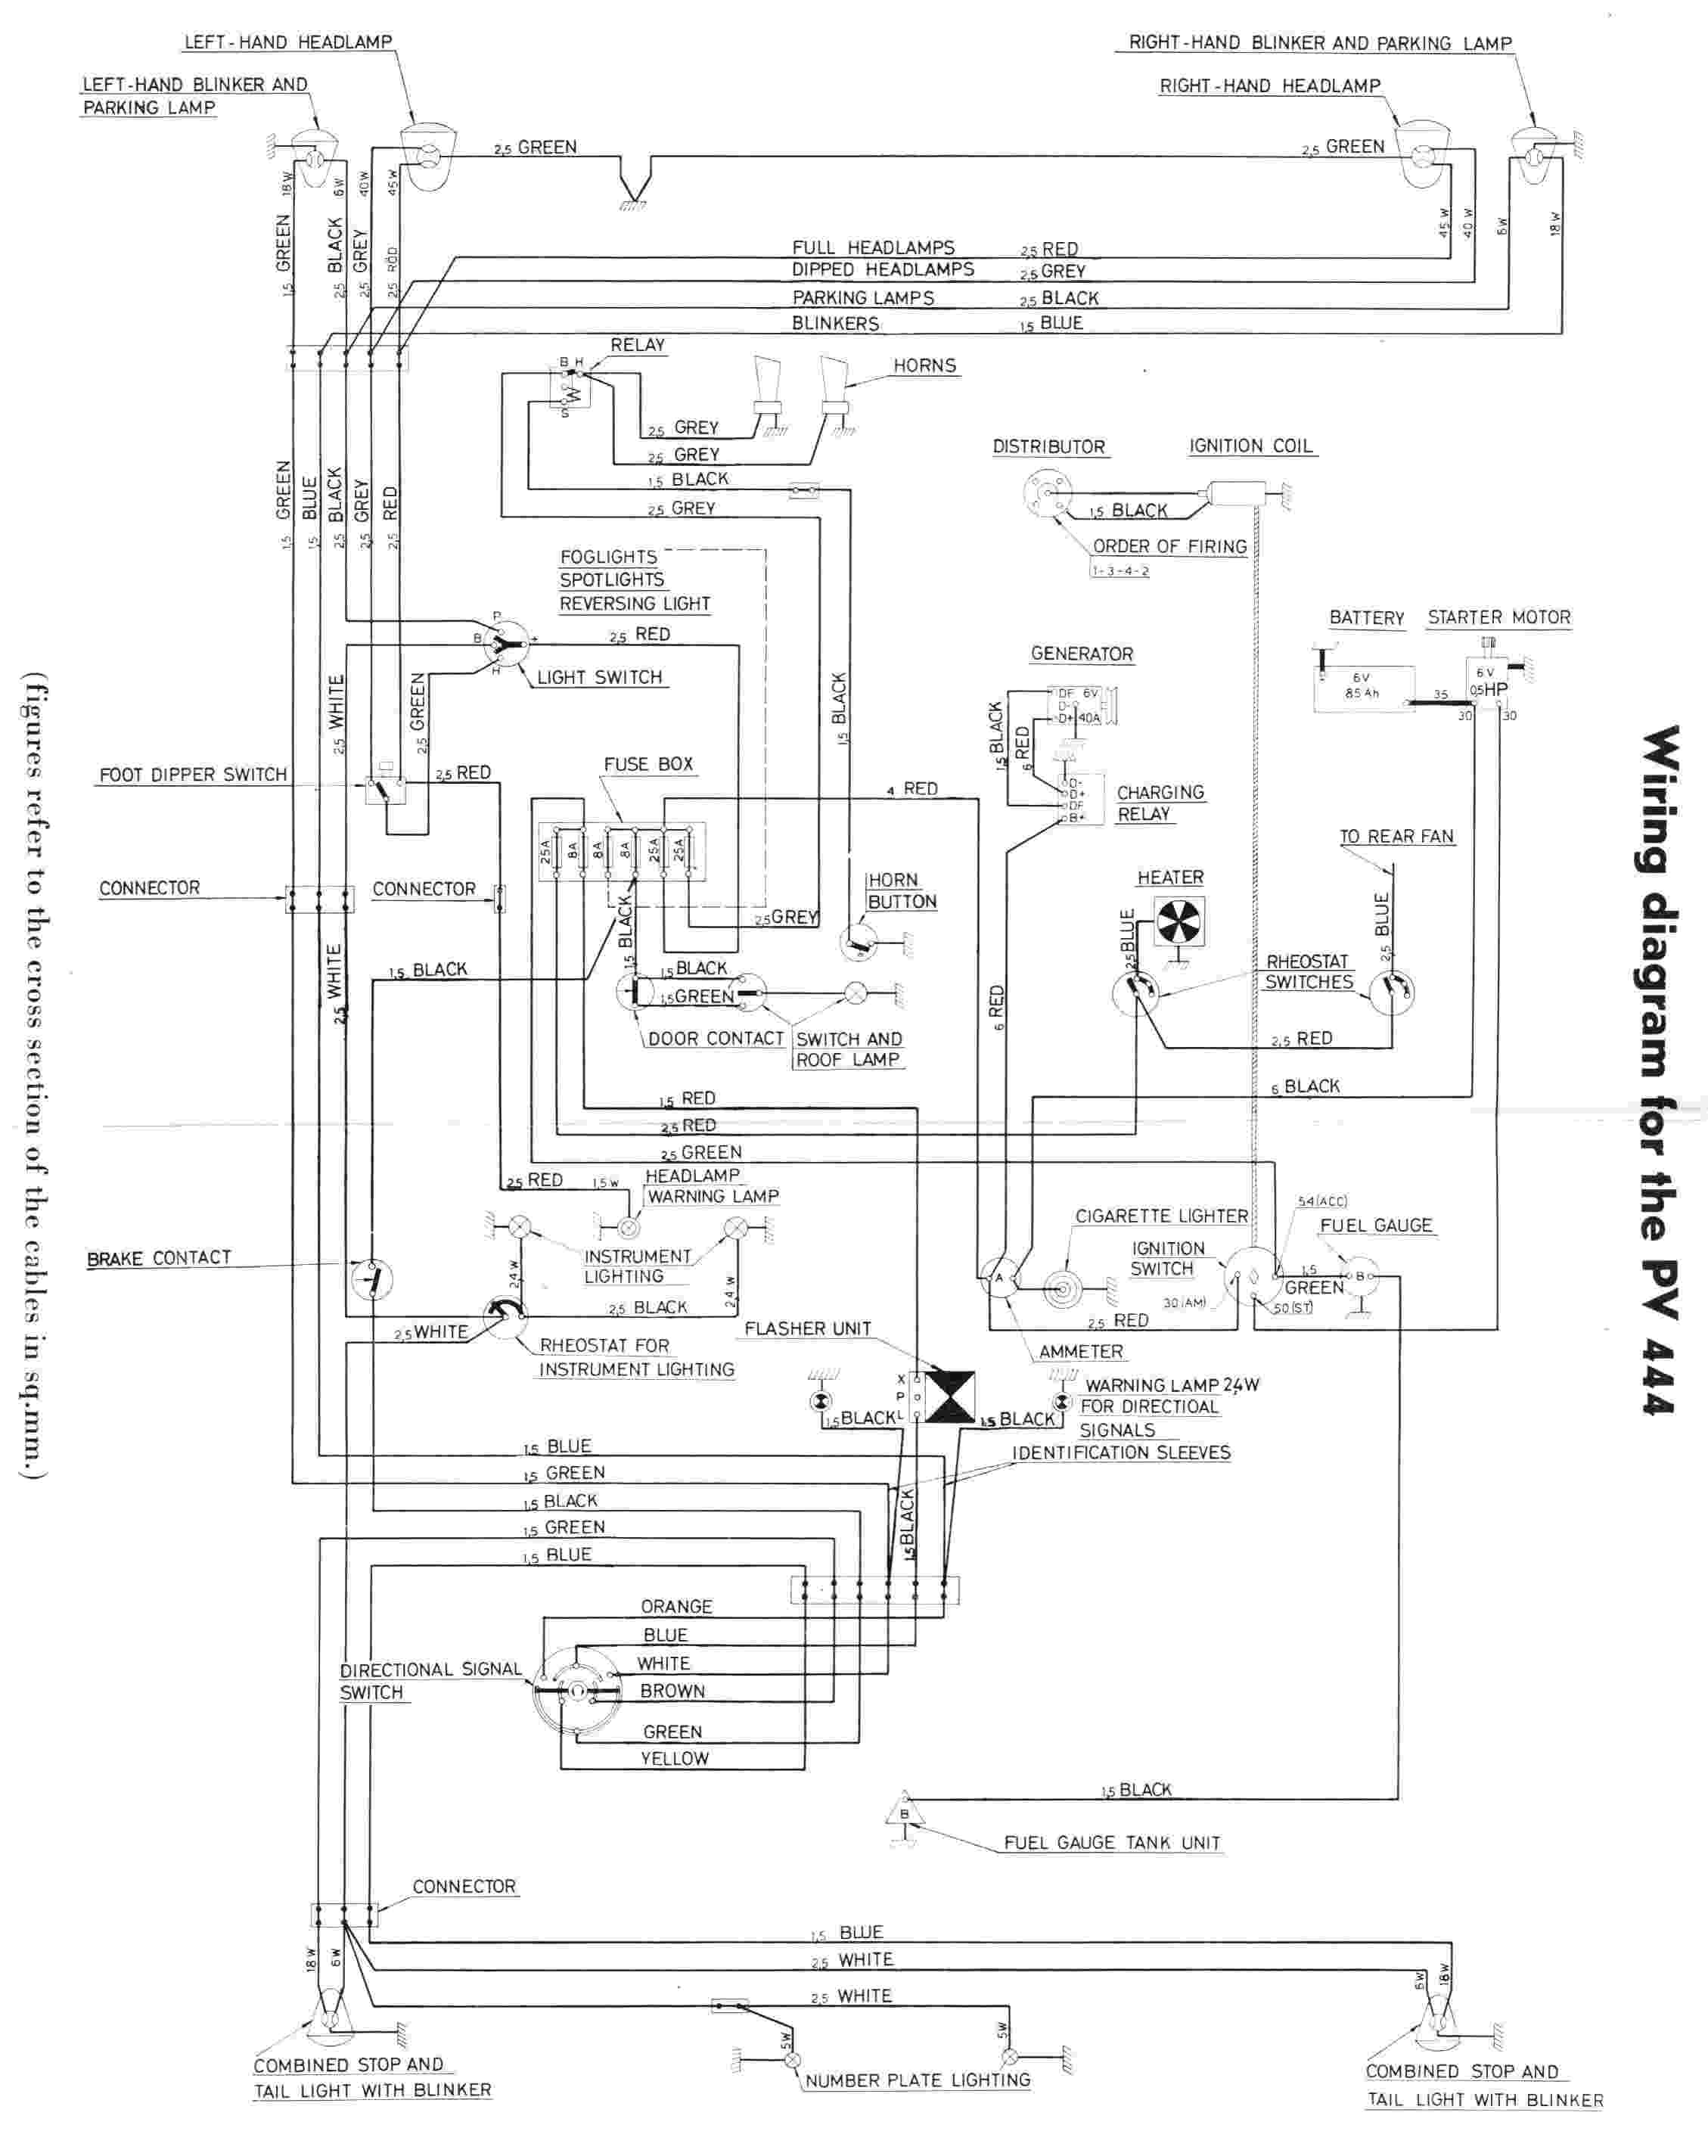 hight resolution of volvo ignition wiring diagram wiring diagram database rh 11 11 1 infection nl de volvo v70